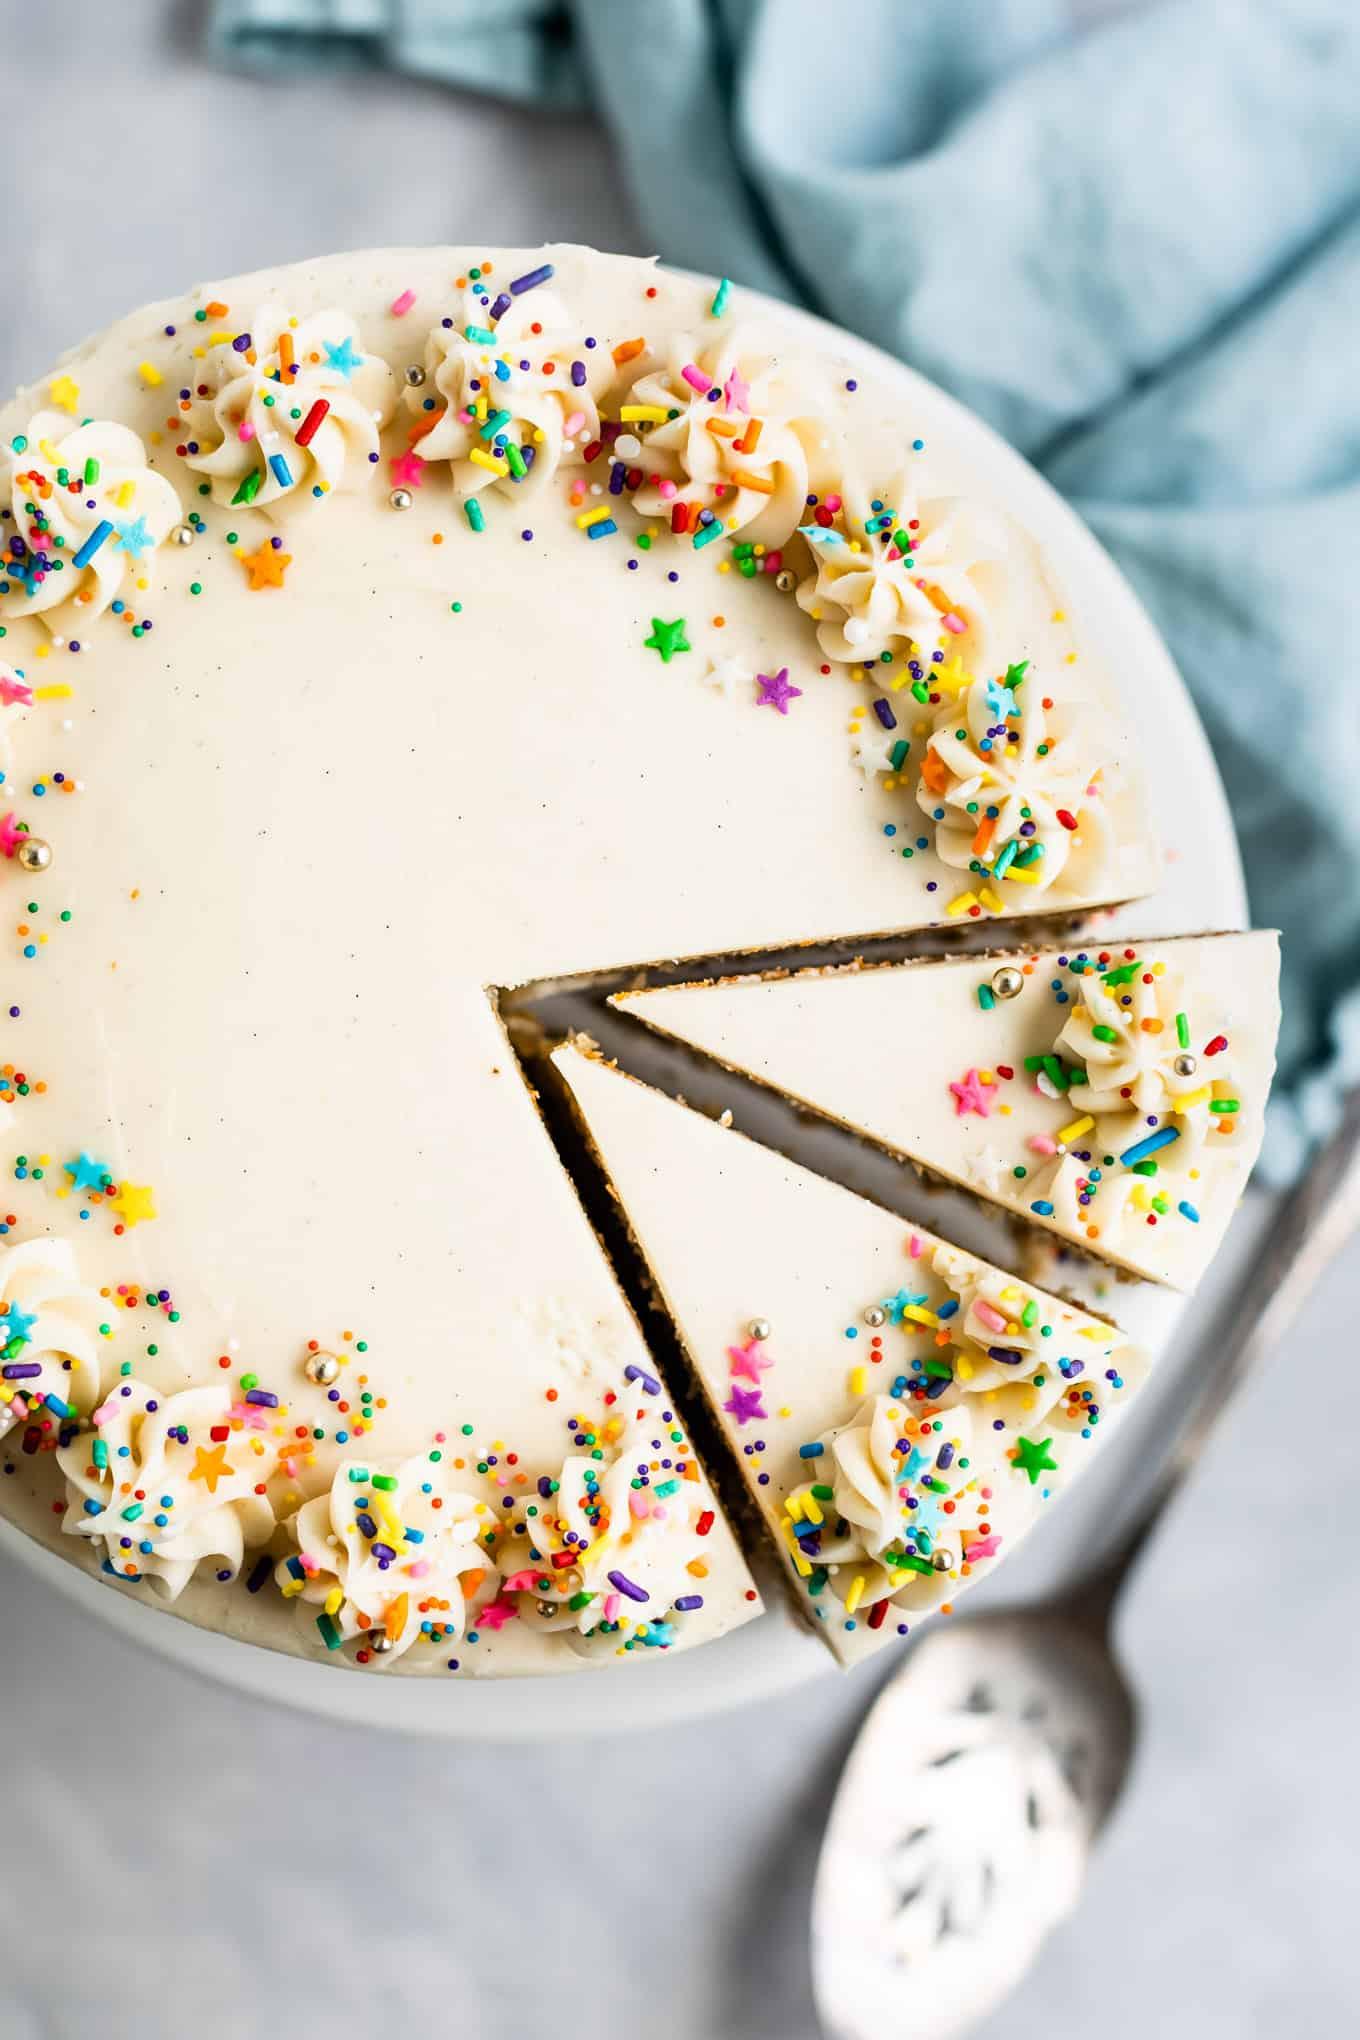 Gluten-Free Cake Recipes from Scratch